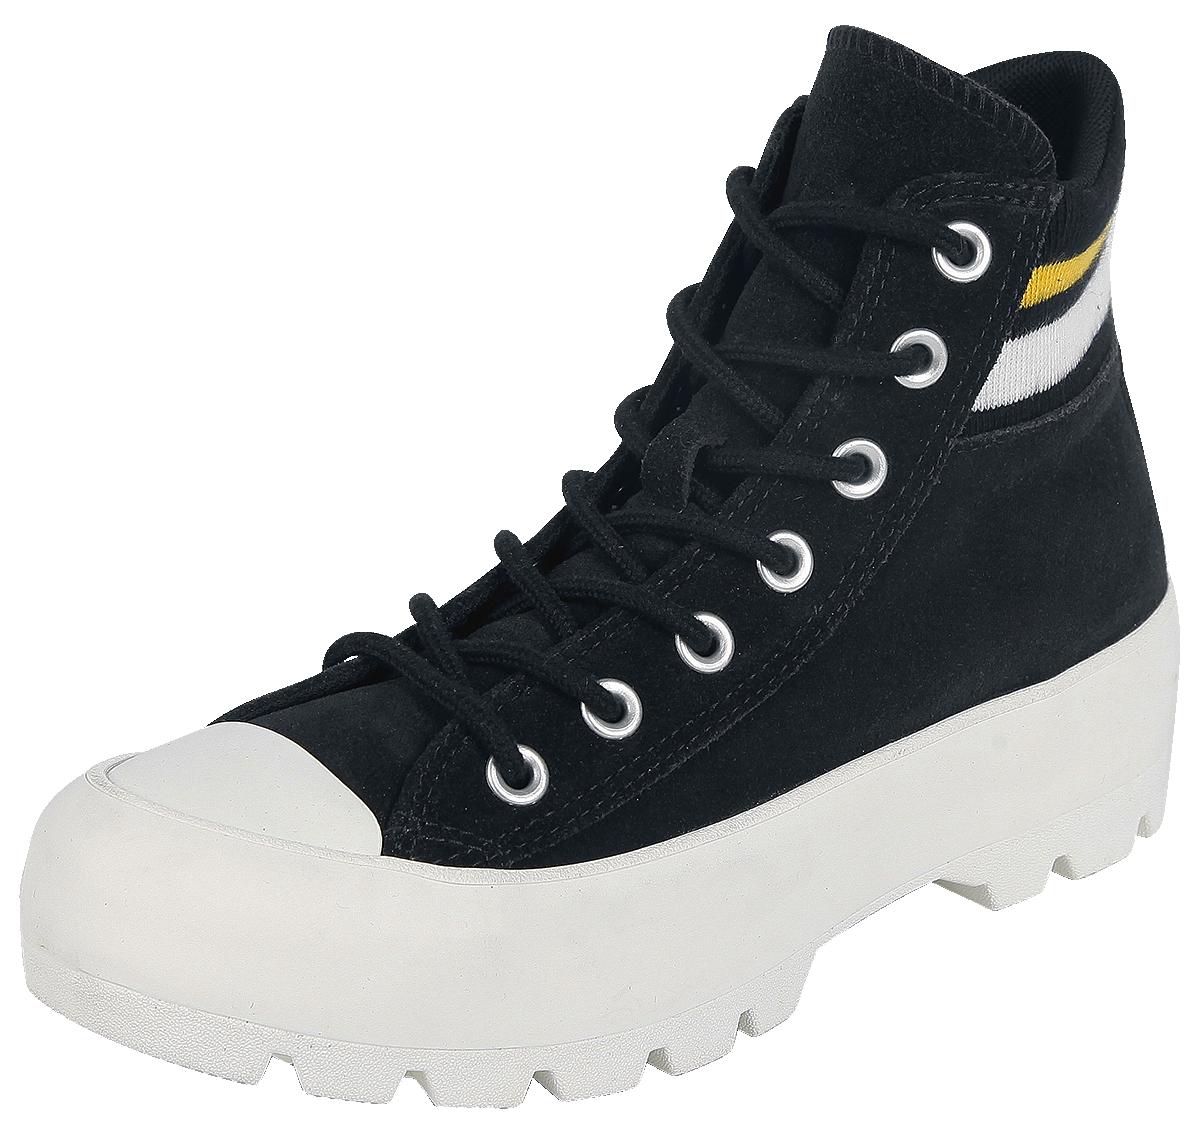 Converse - Chuck Taylor All Star Lugged Varsity Hi - Sneakers - black image